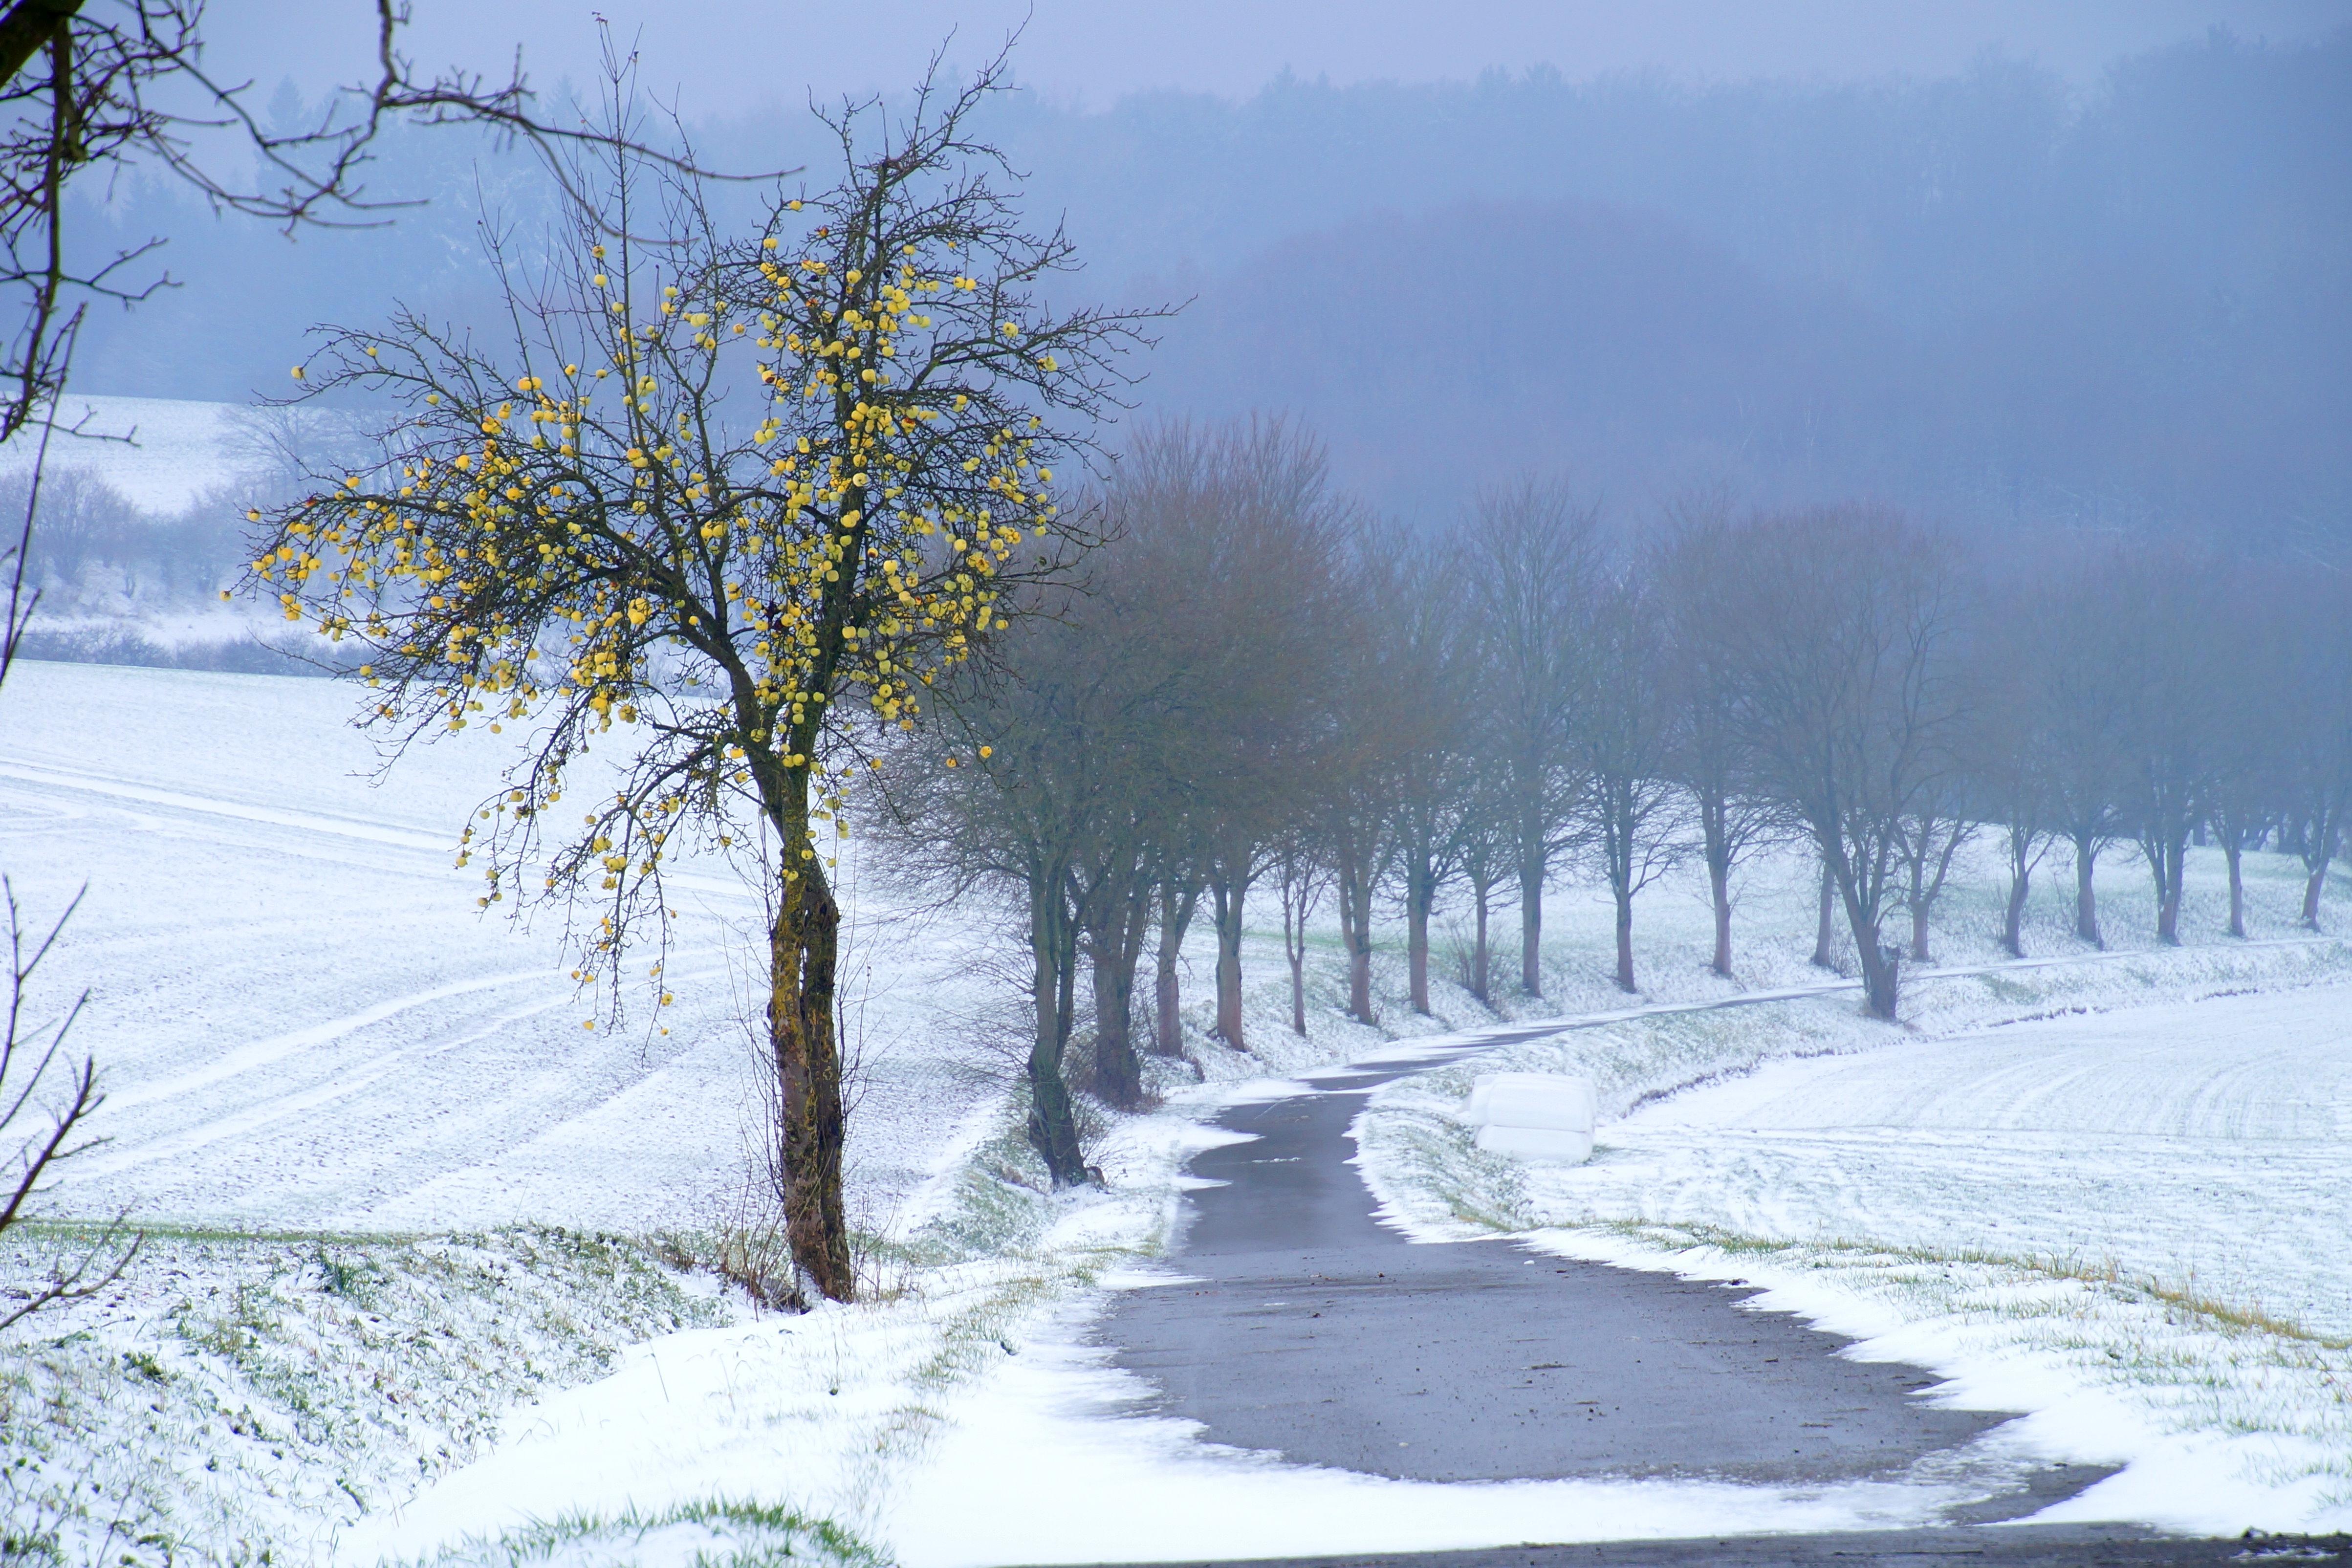 Januar Winter Bild des Monats